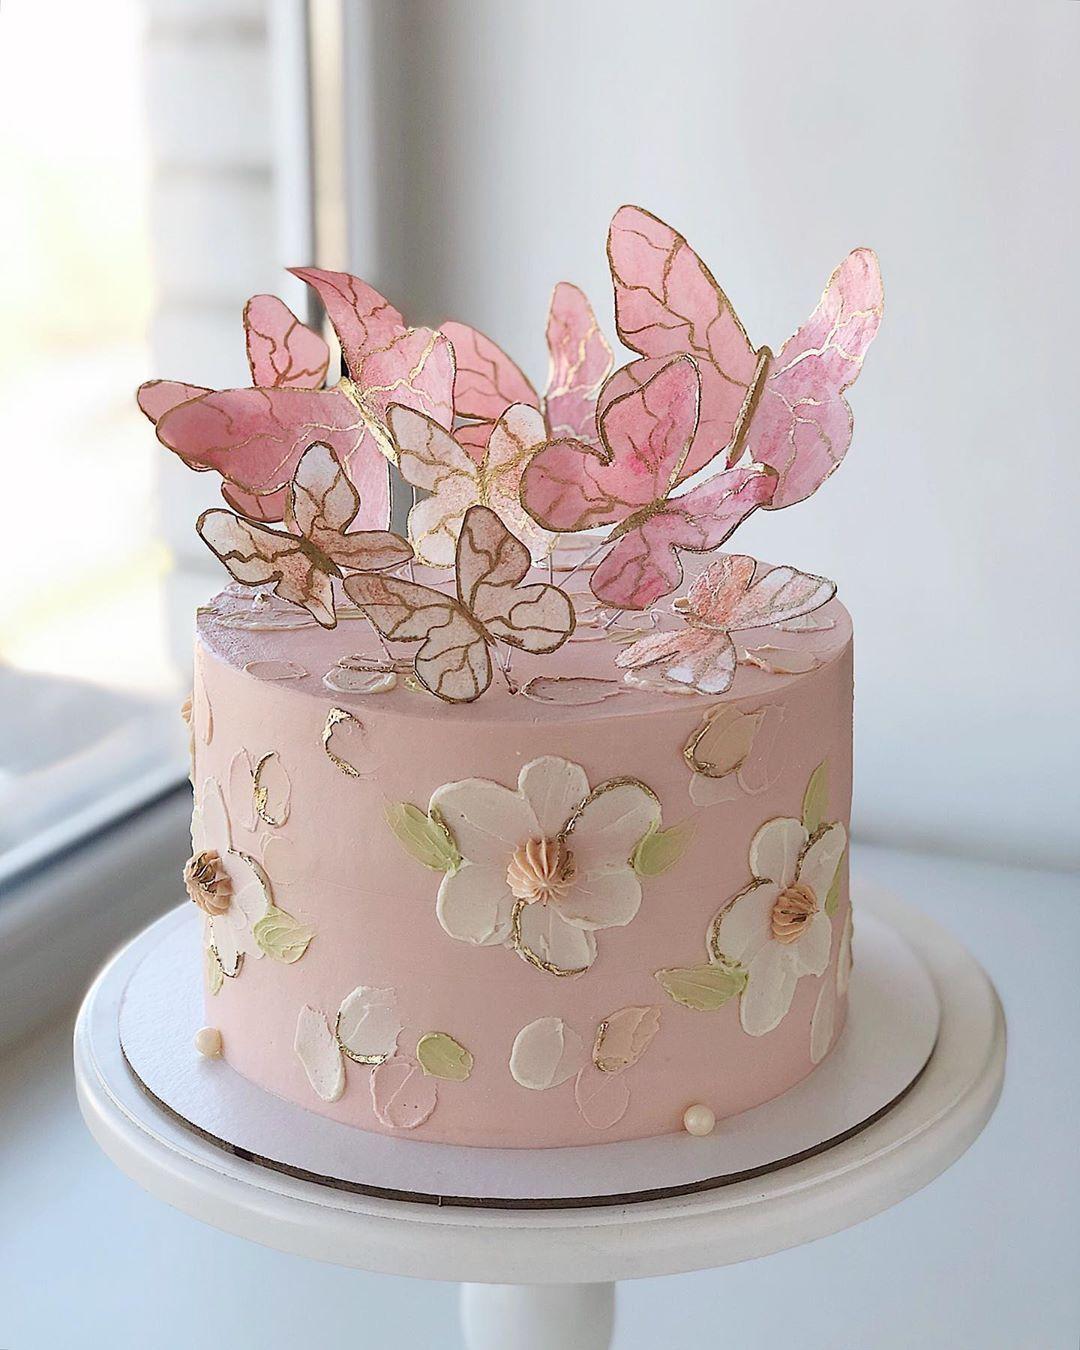 Beautiful Wedding Cakes Designs Inspo 2020 в 2020 г (с